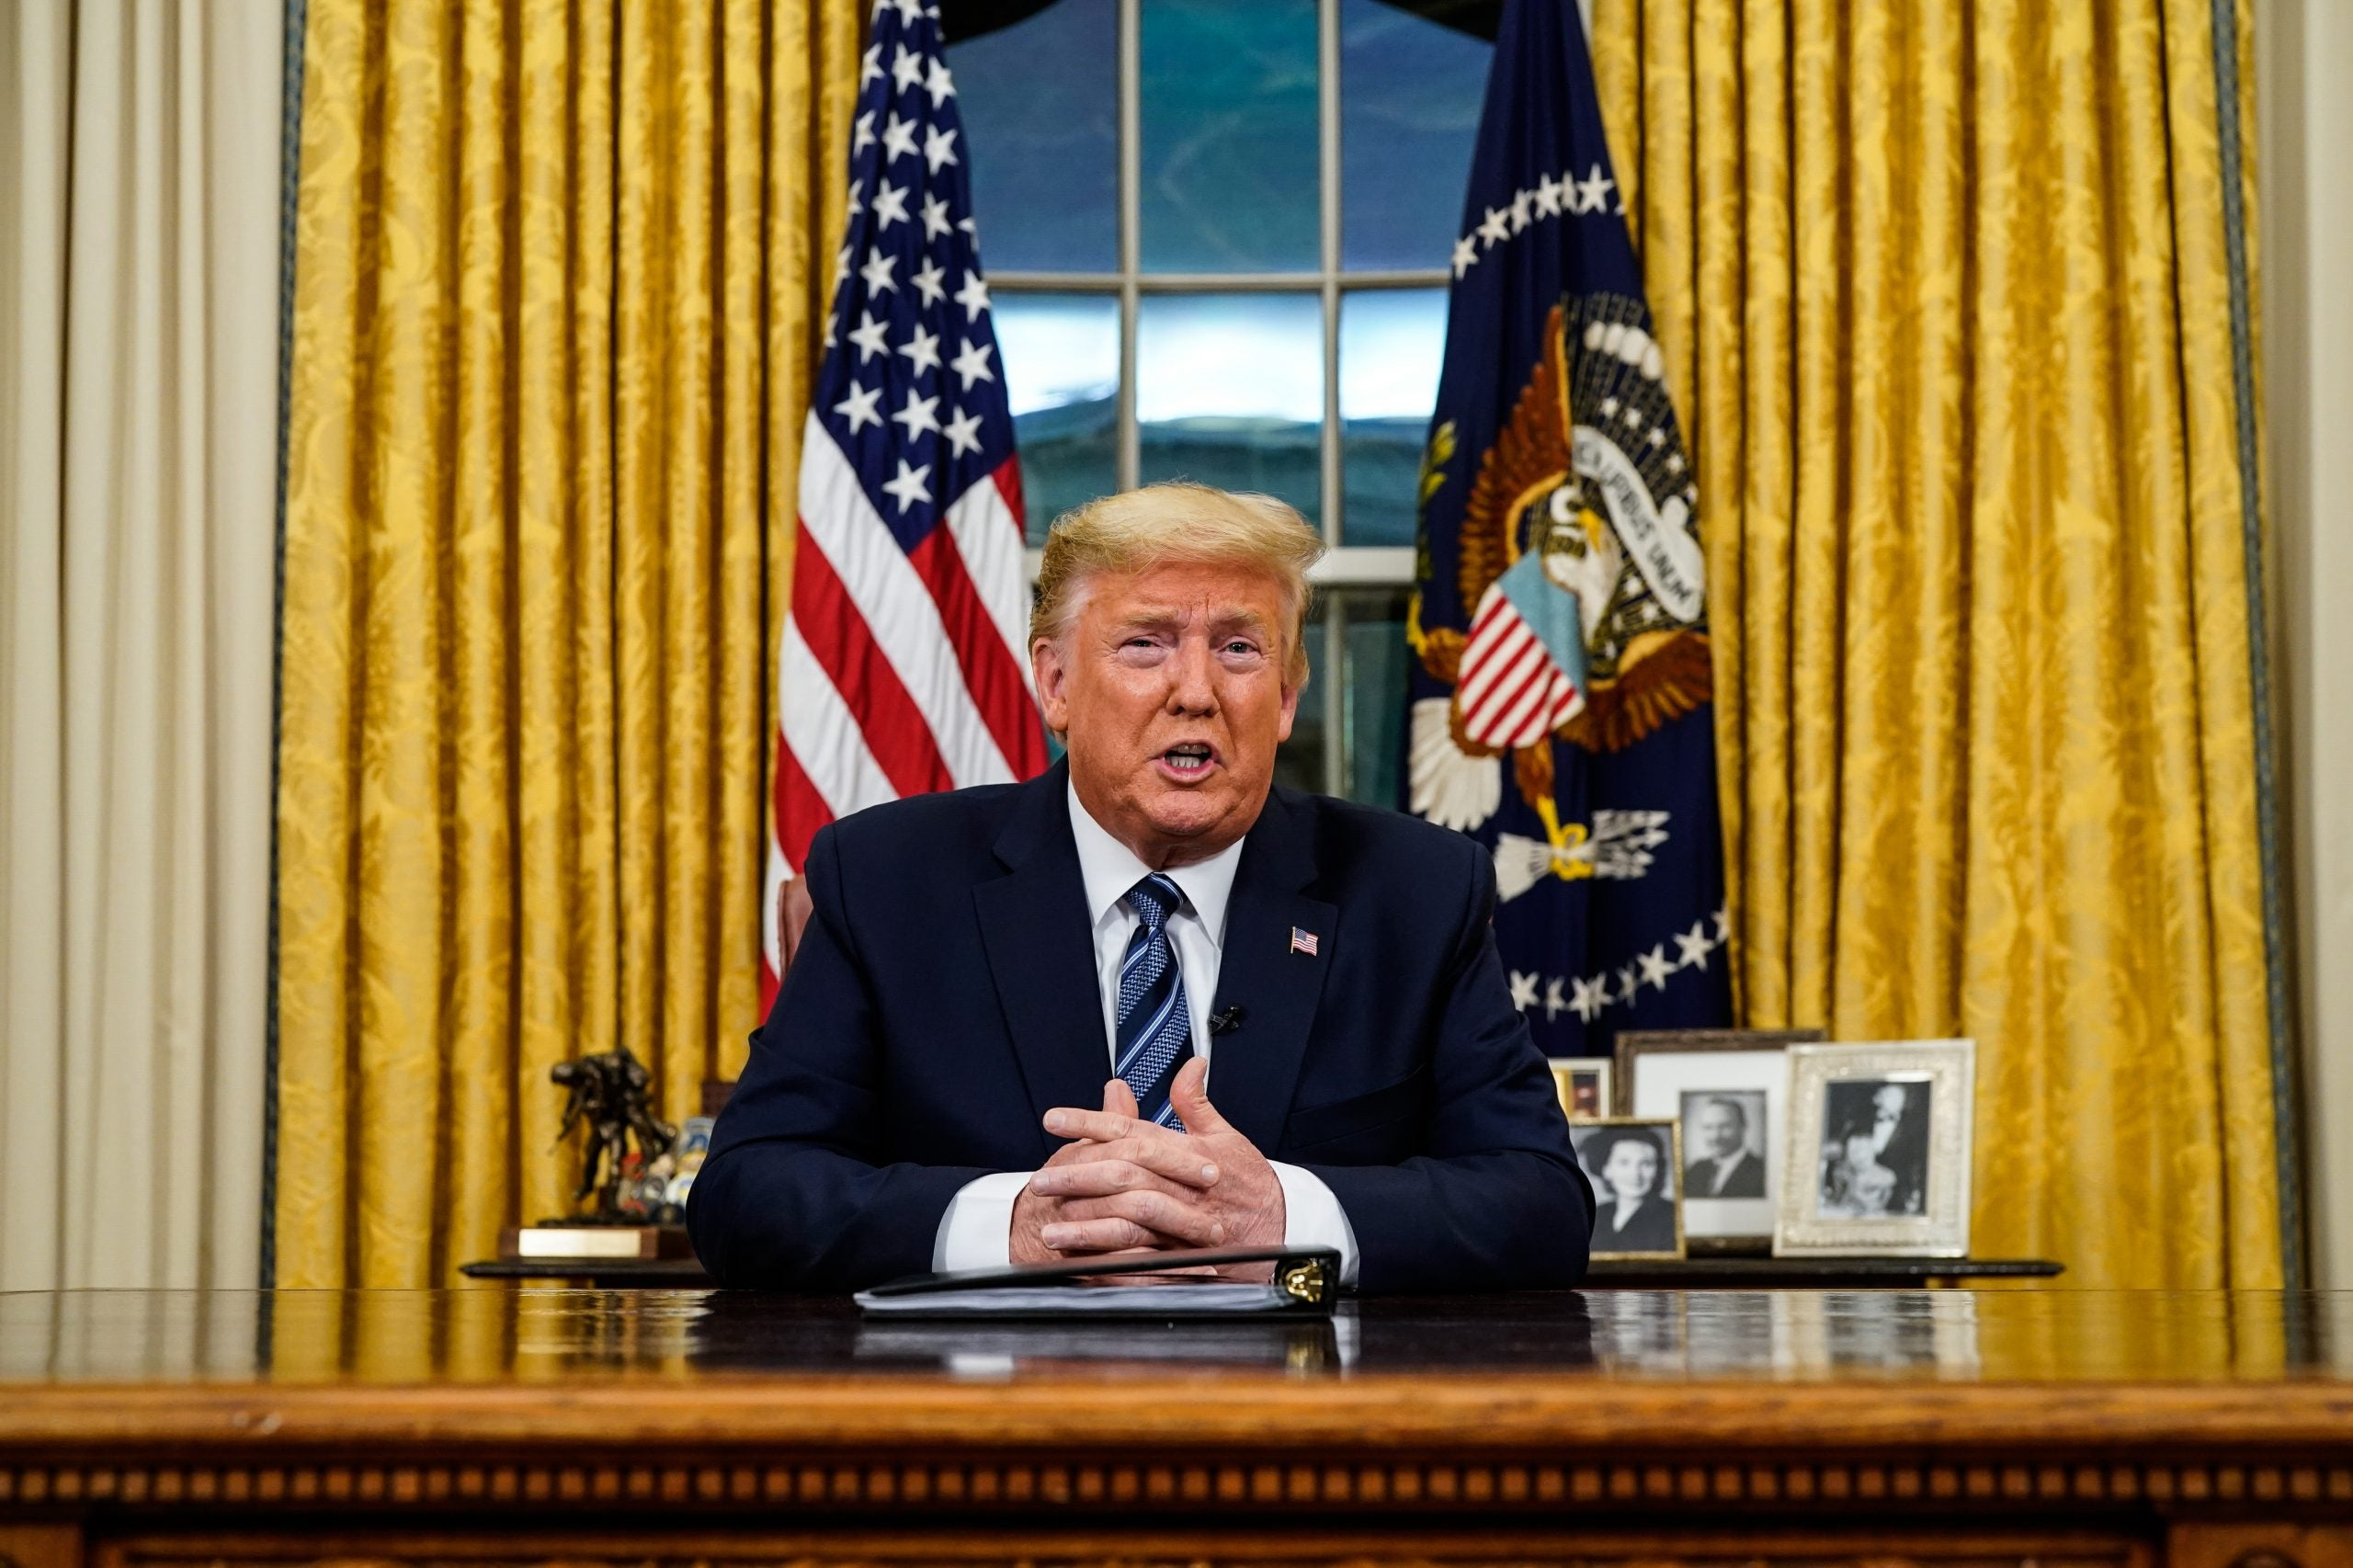 Donald Trump calls COVID-19 'Chinese virus' and kung flu